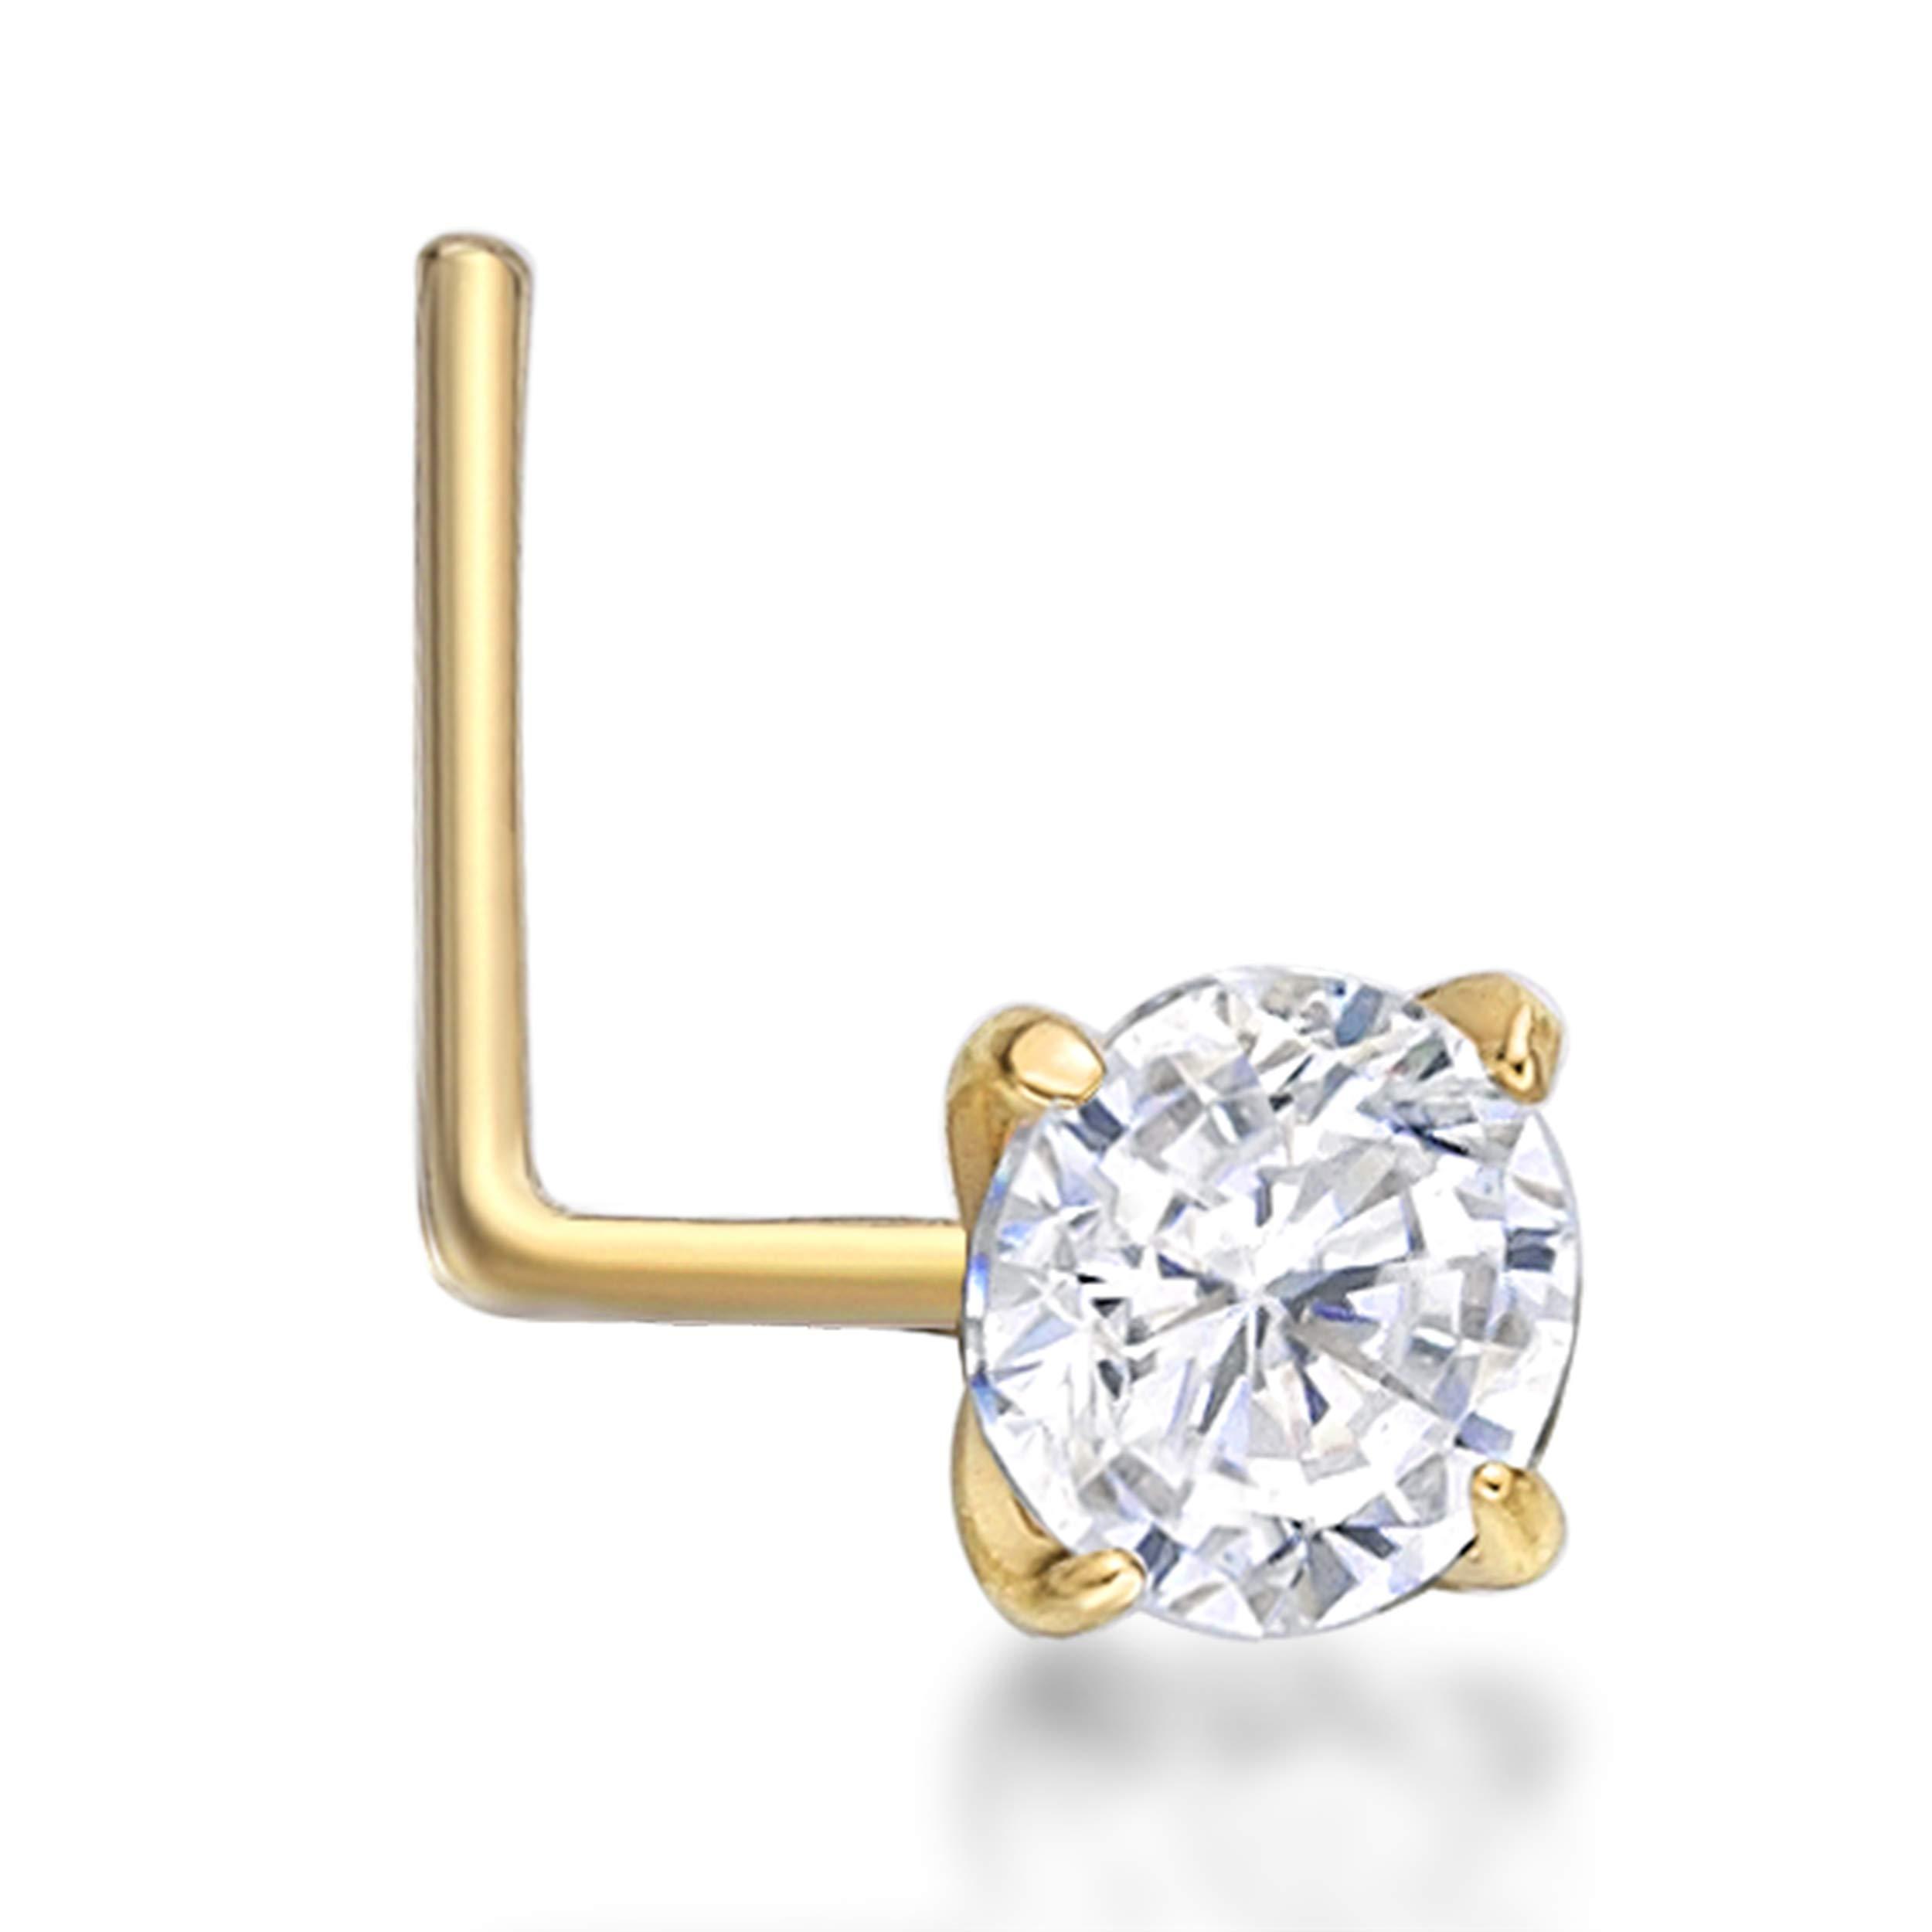 Lavari - 14K Yellow Gold 3mm White Cubic Zirconium Nose Ring L-Shape 22G by Lavari Jewelers